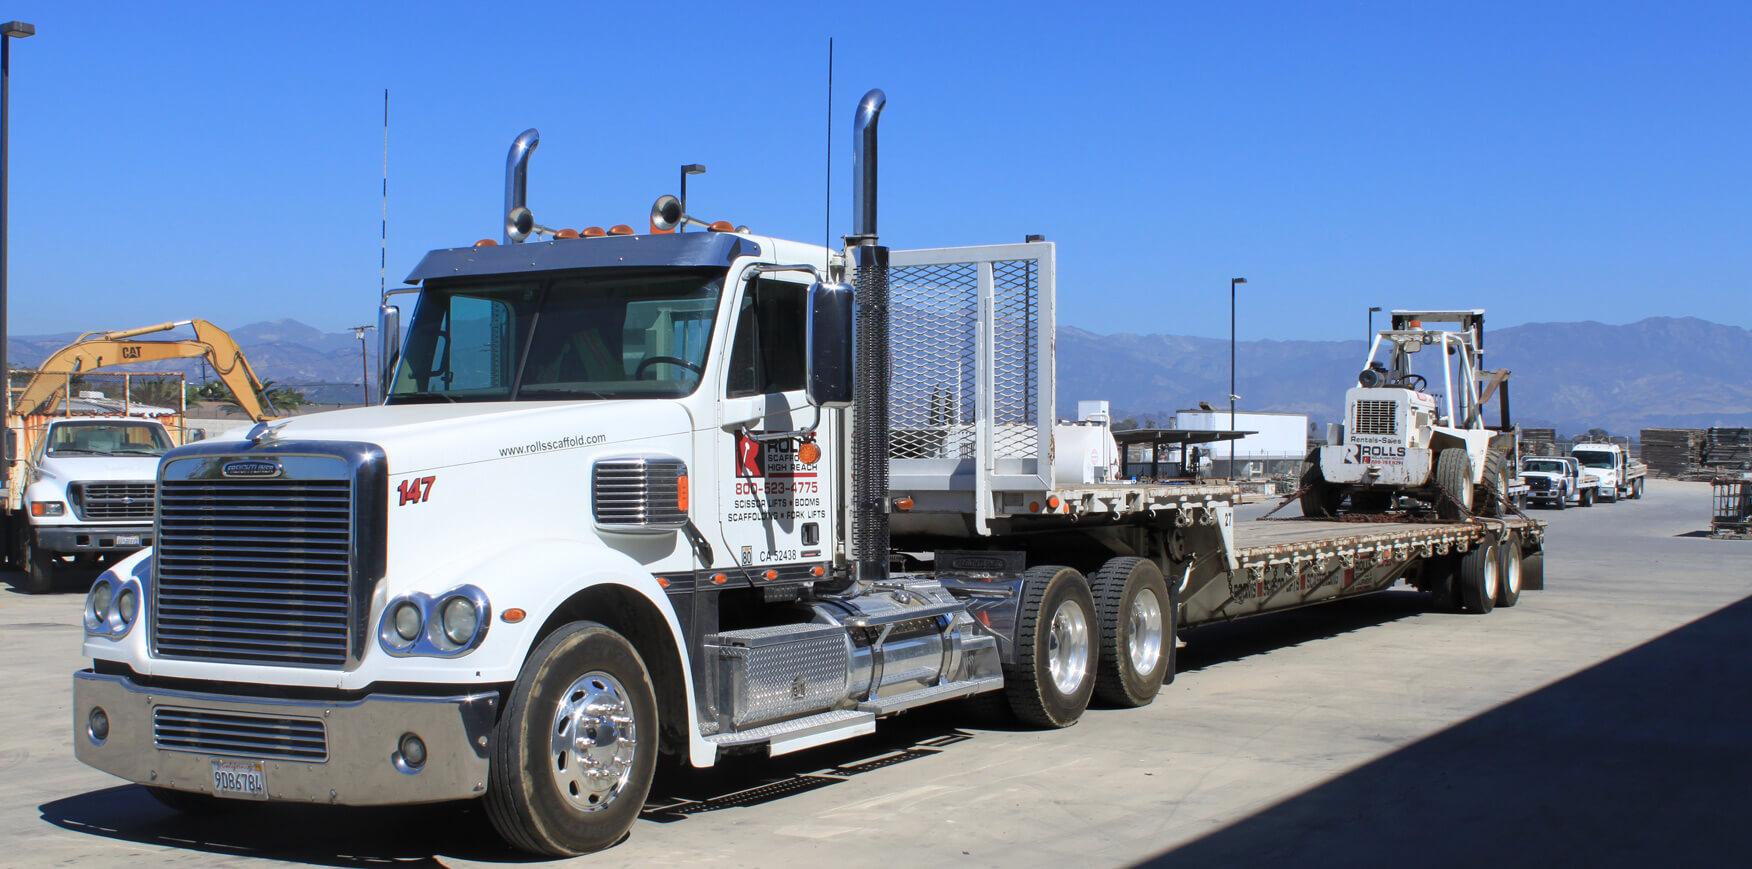 Rolls Scaffold Truck